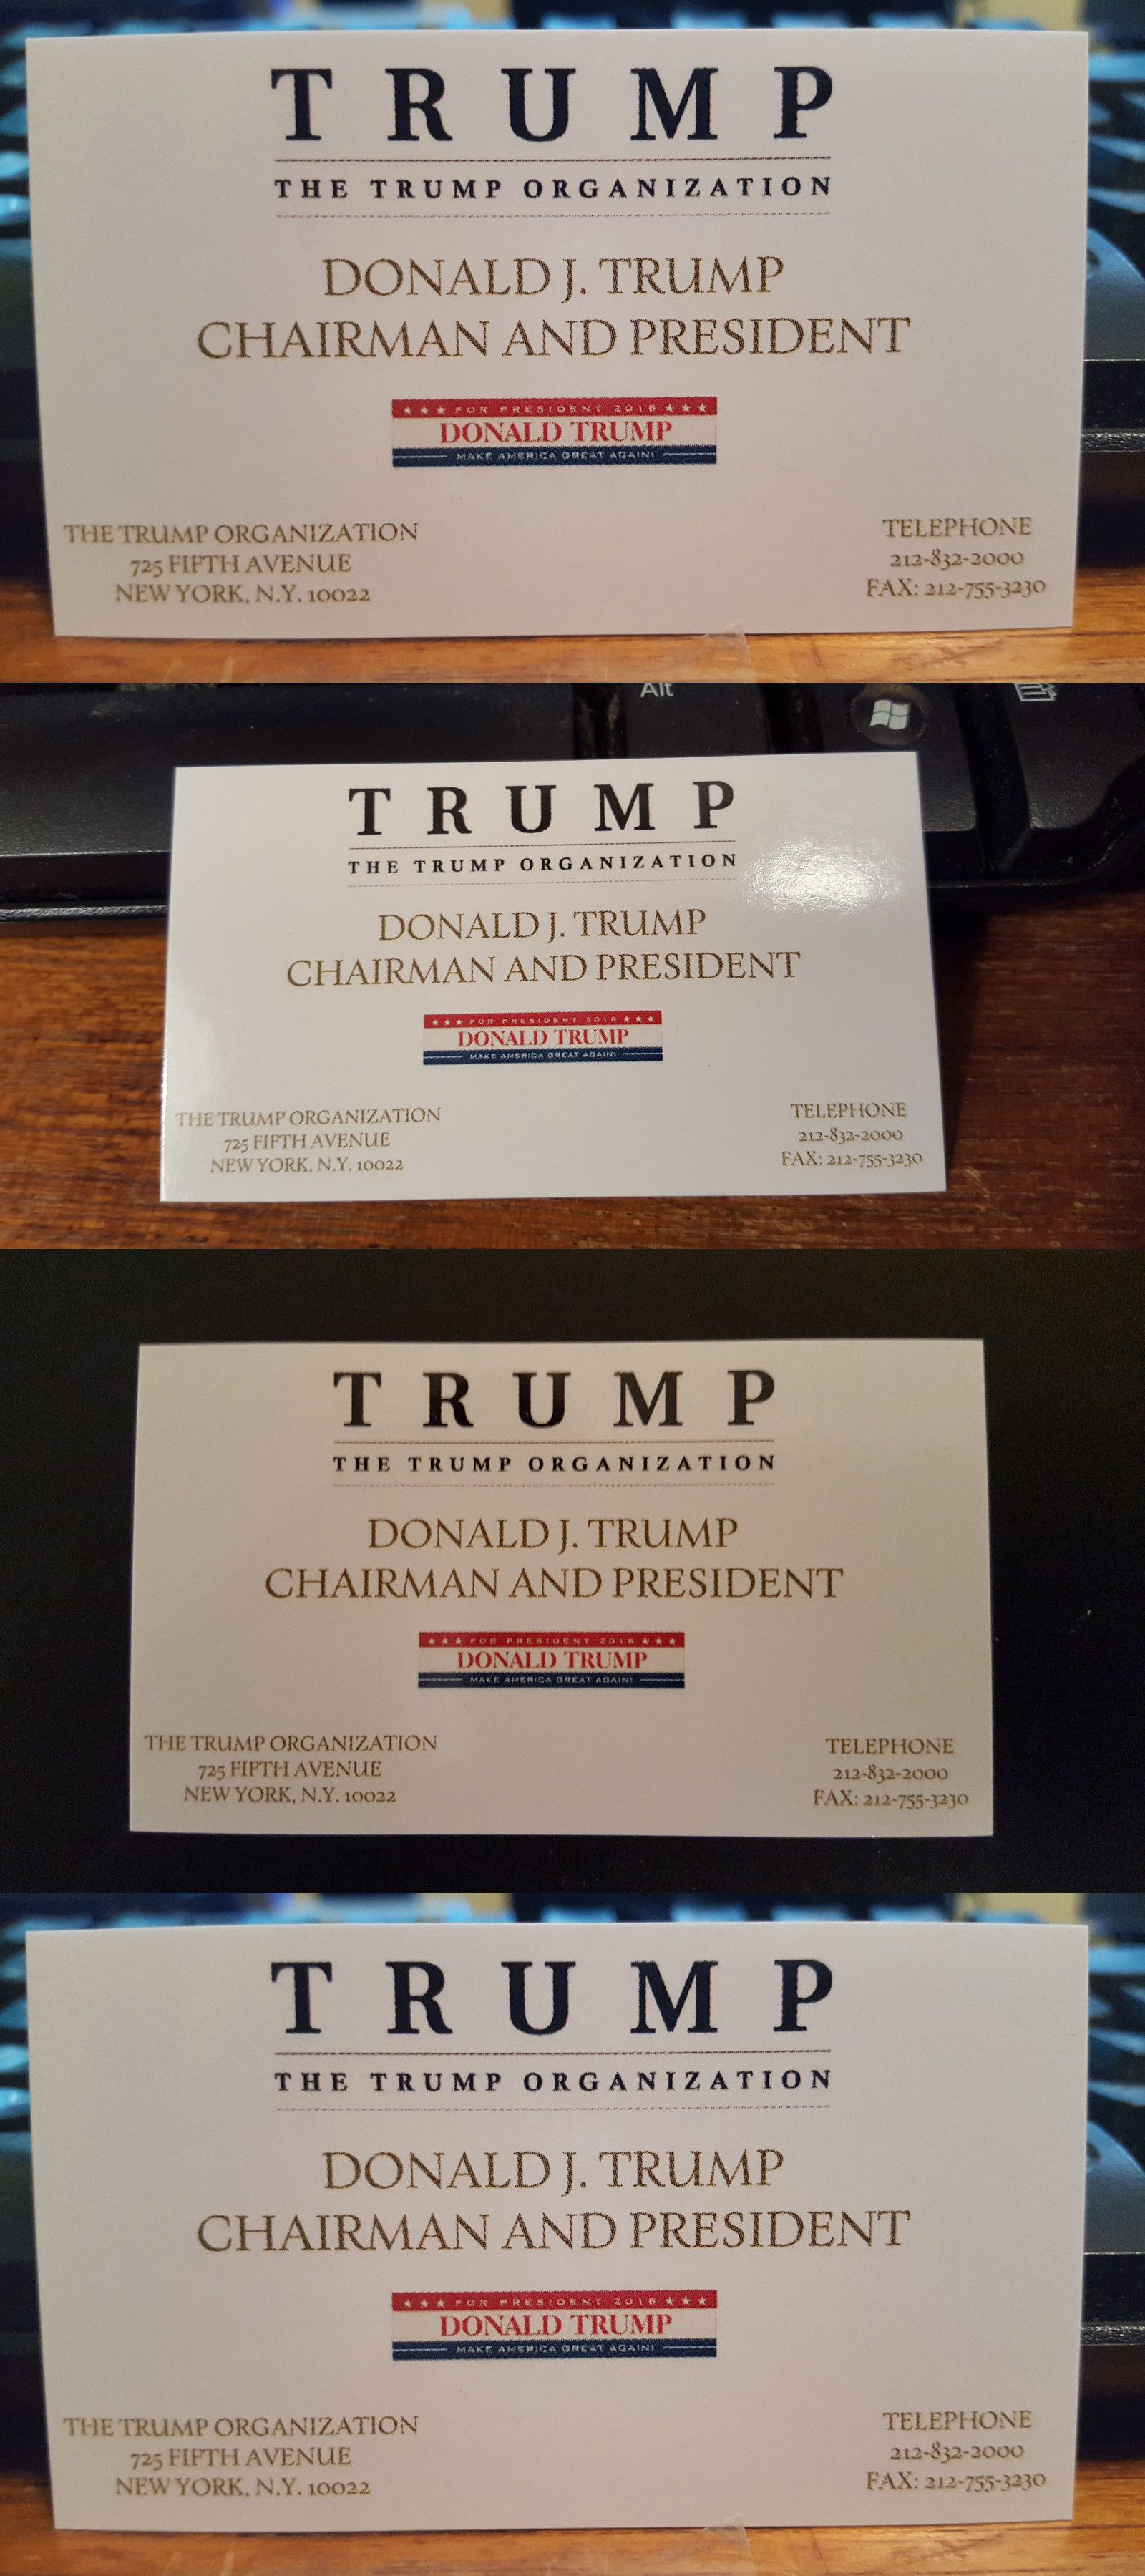 Donald trump donald trump business card republican president gop donald trump donald trump business card republican president gop presidential race 2016 new colourmoves